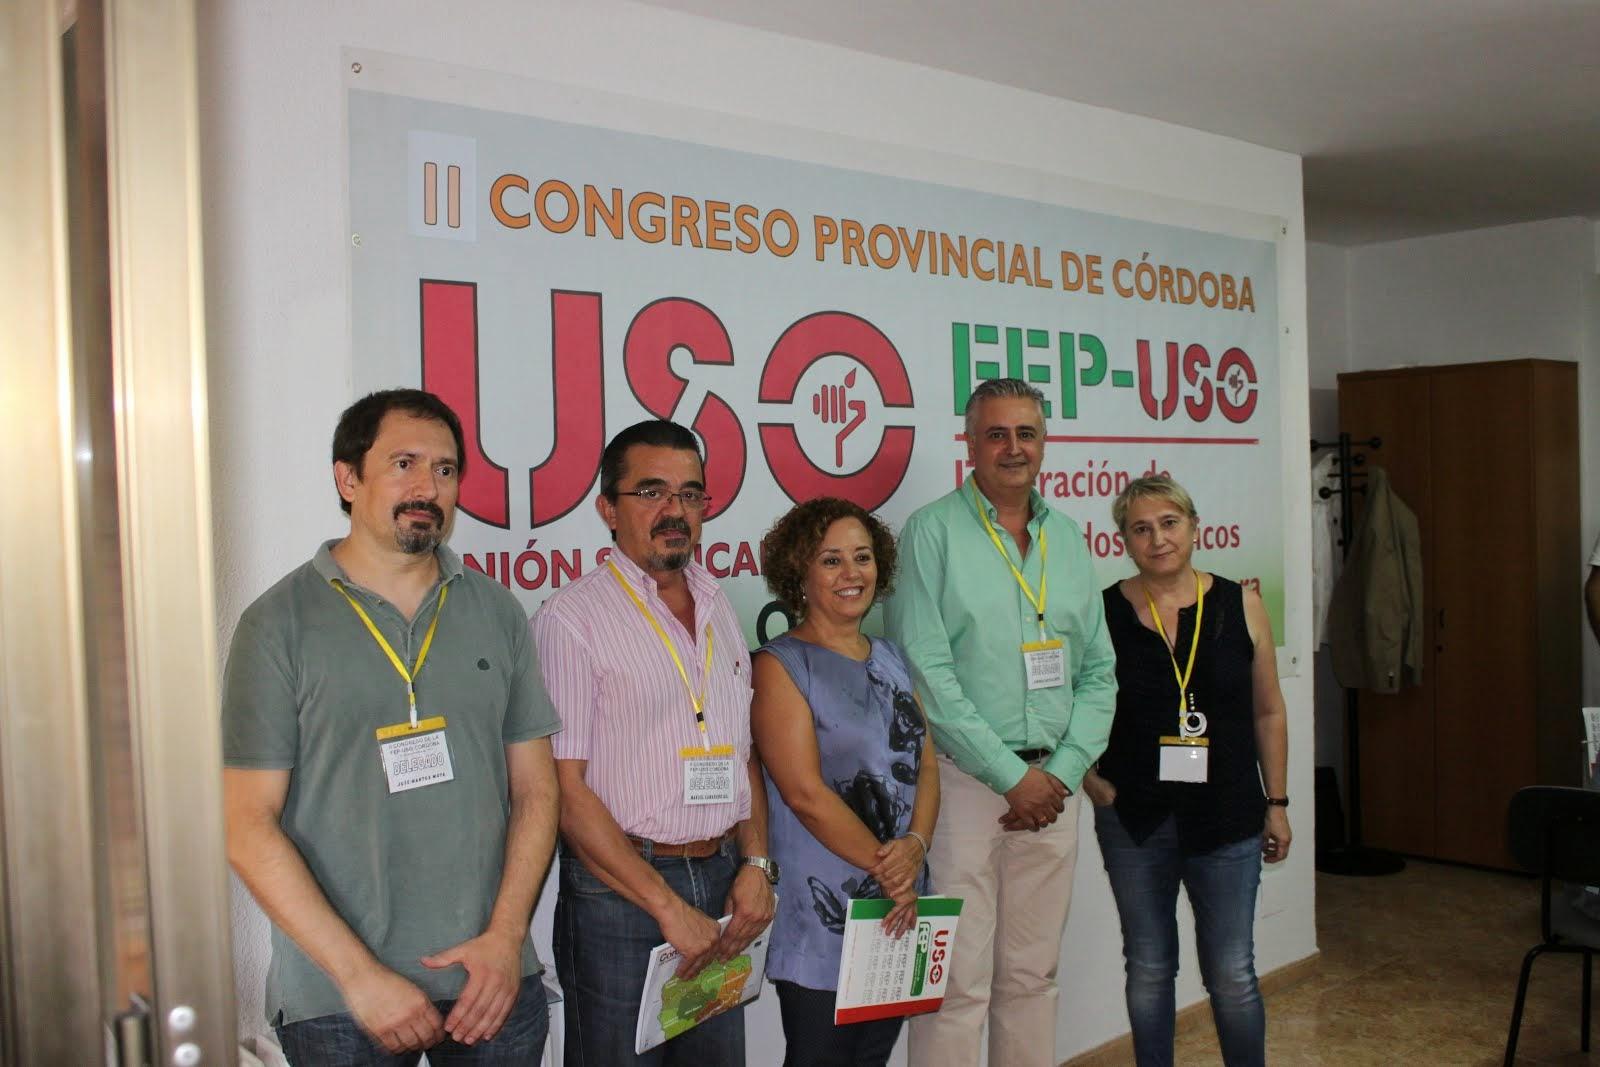 II Congreso Provincial FEP-USO Córdoba 18.9.14).